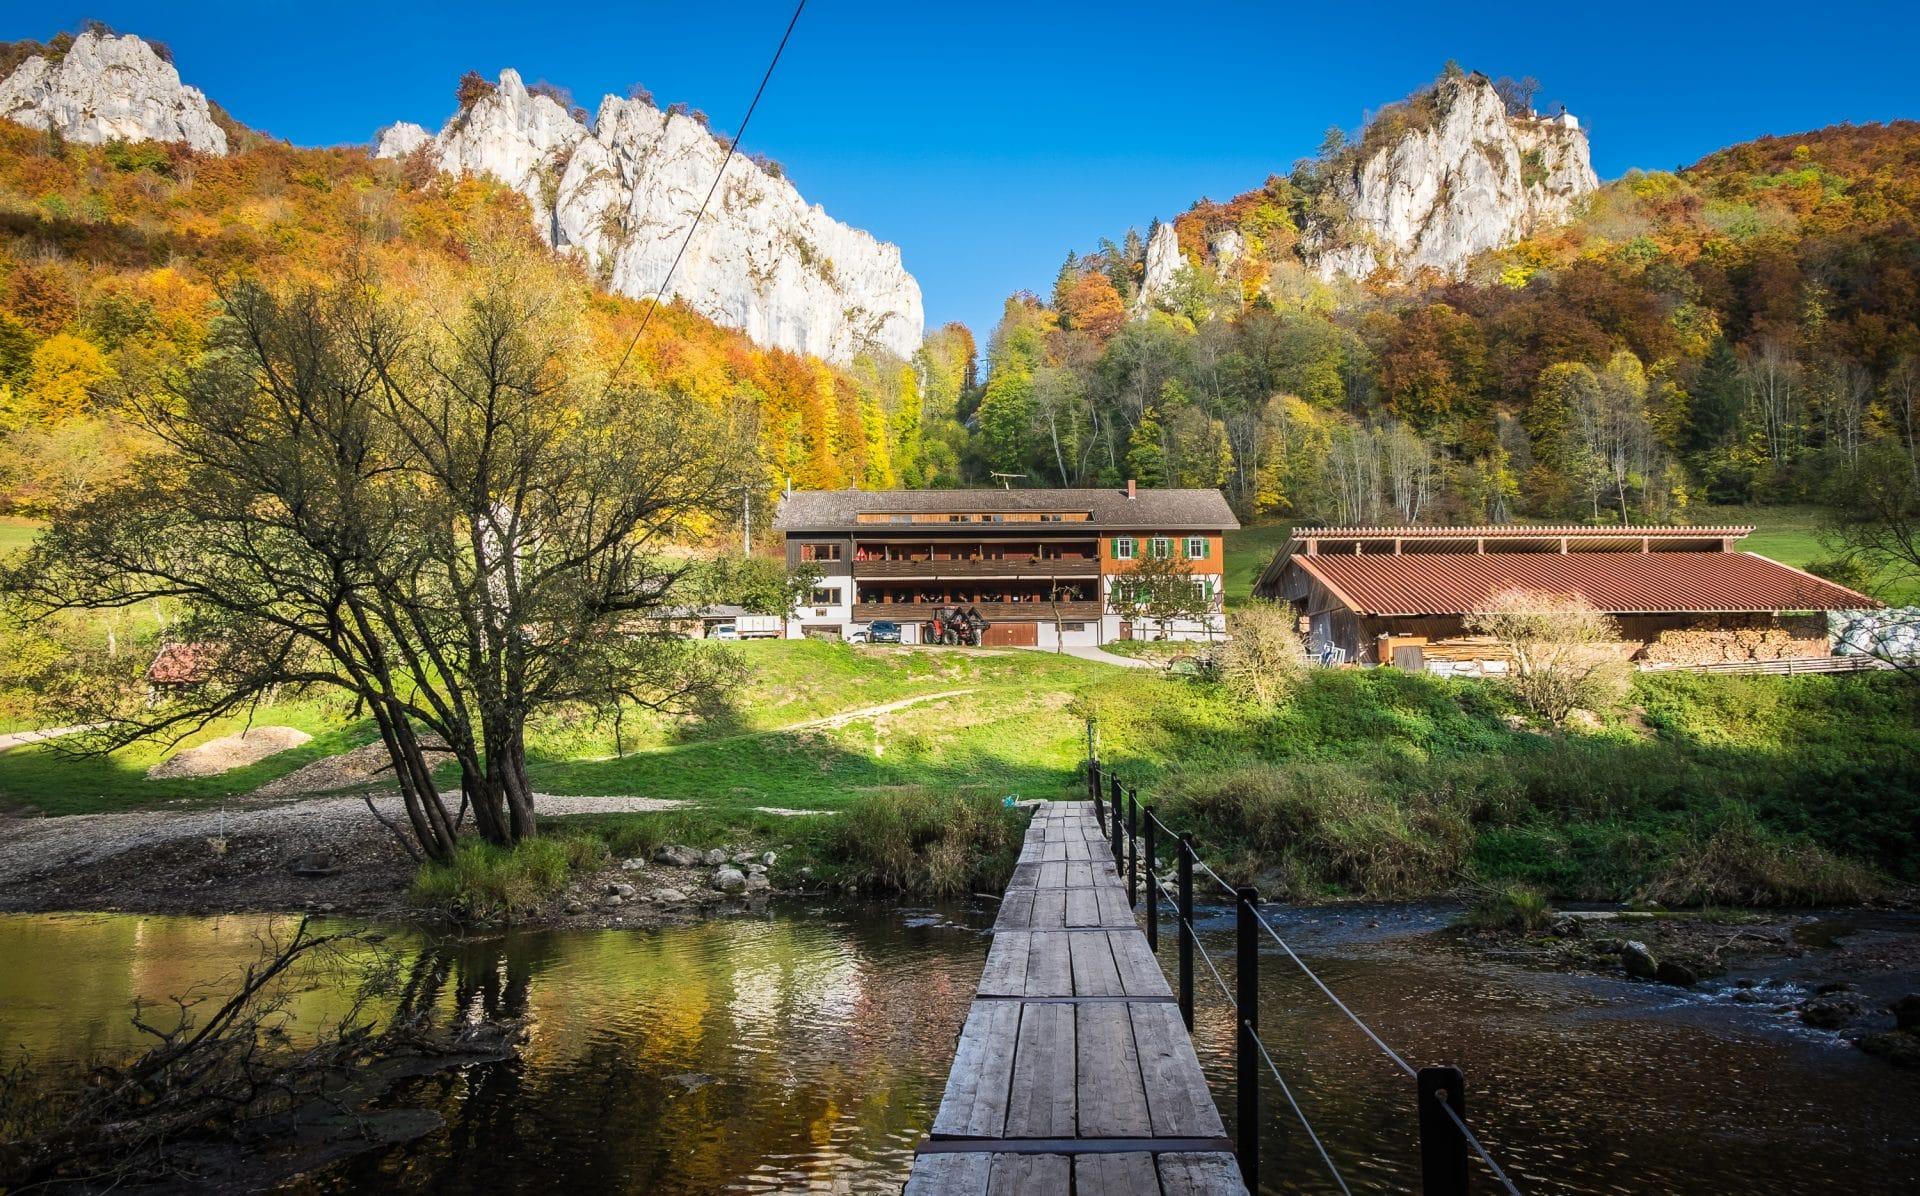 Jägerhaus und Oberes Donautal